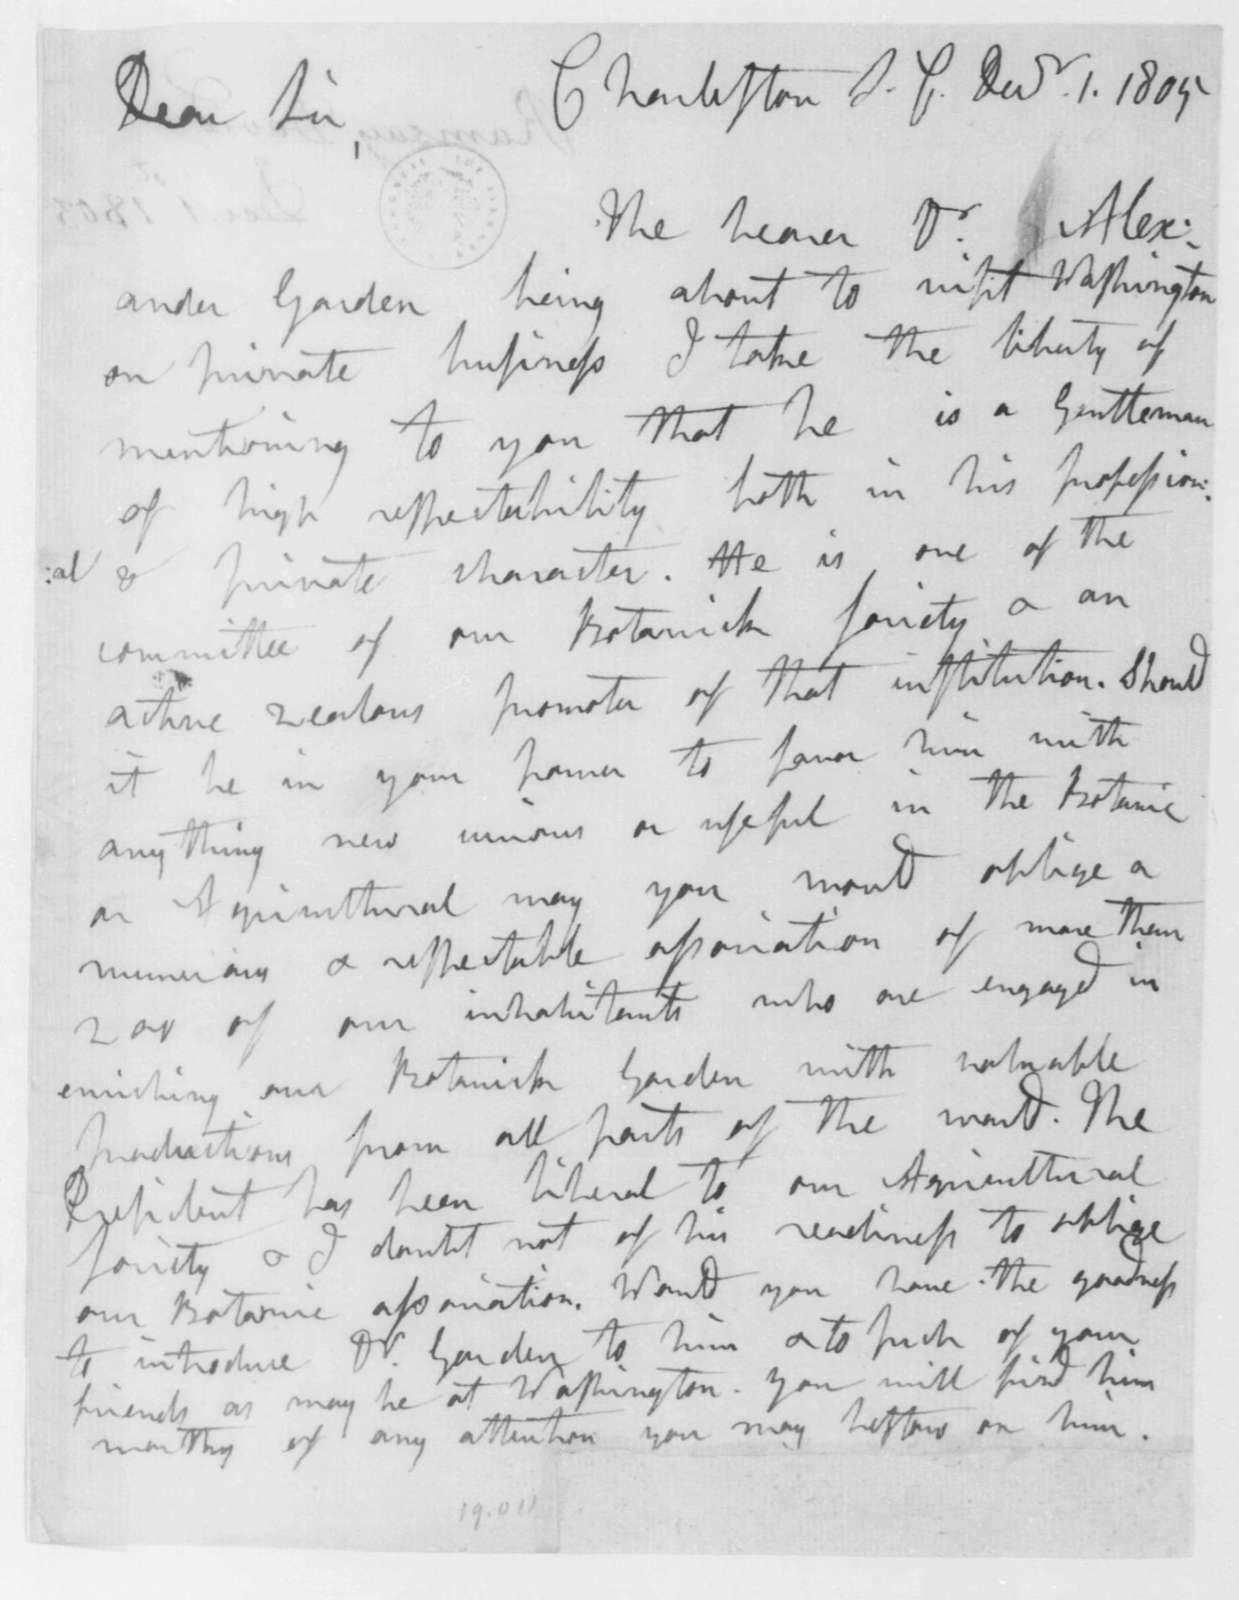 David Ramsay to James Madison, December 1, 1805.